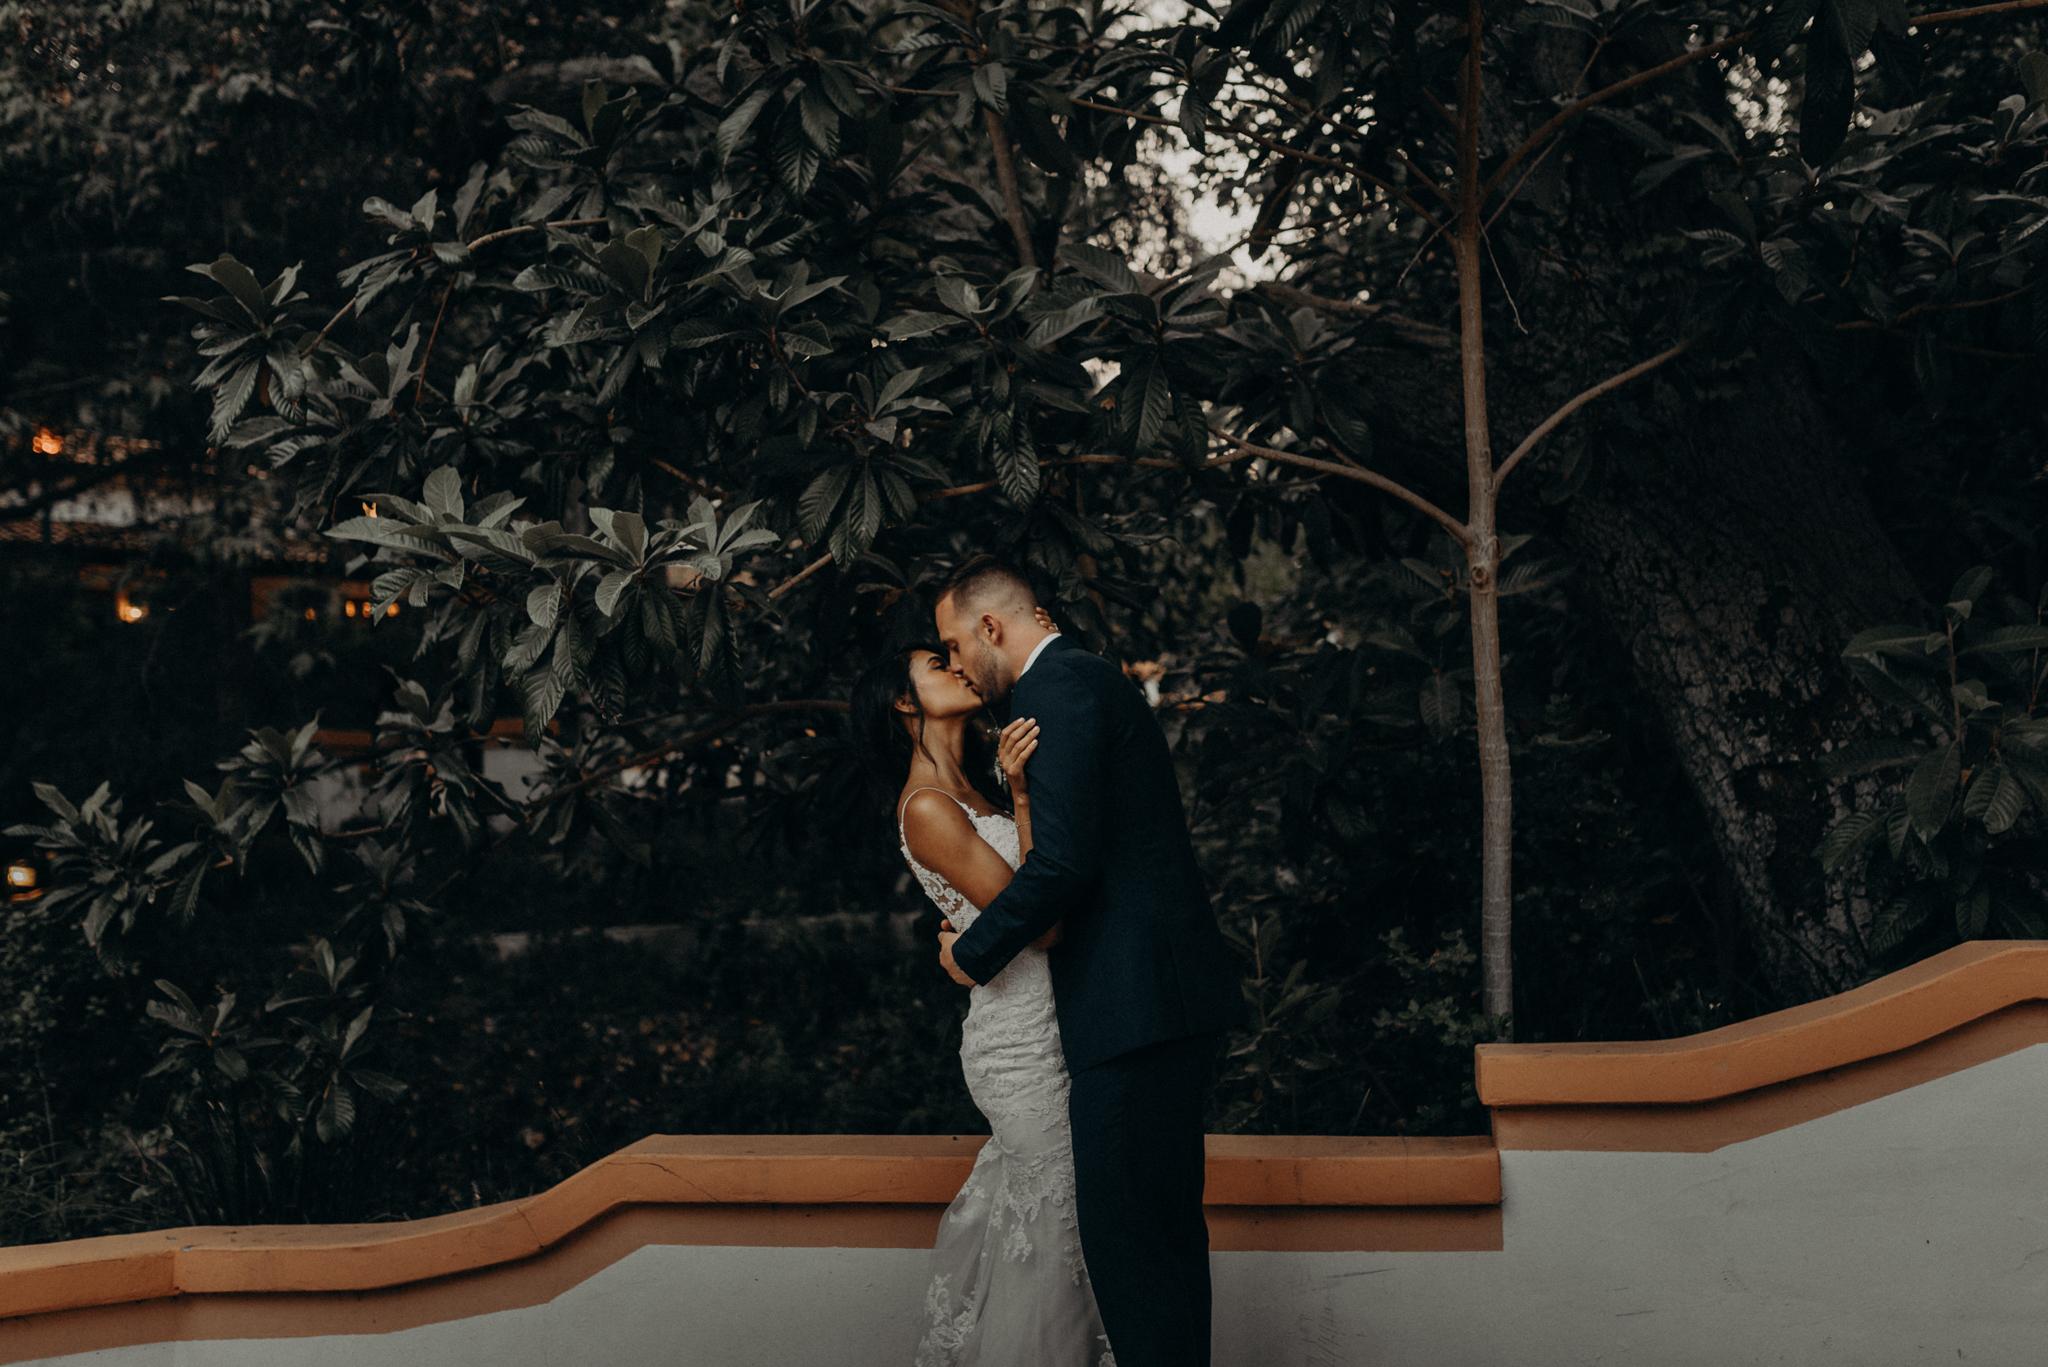 Isaiah + Taylor Photography - Rancho Las Lomas Wedding, Los Angeles Wedding Photographer-131.jpg